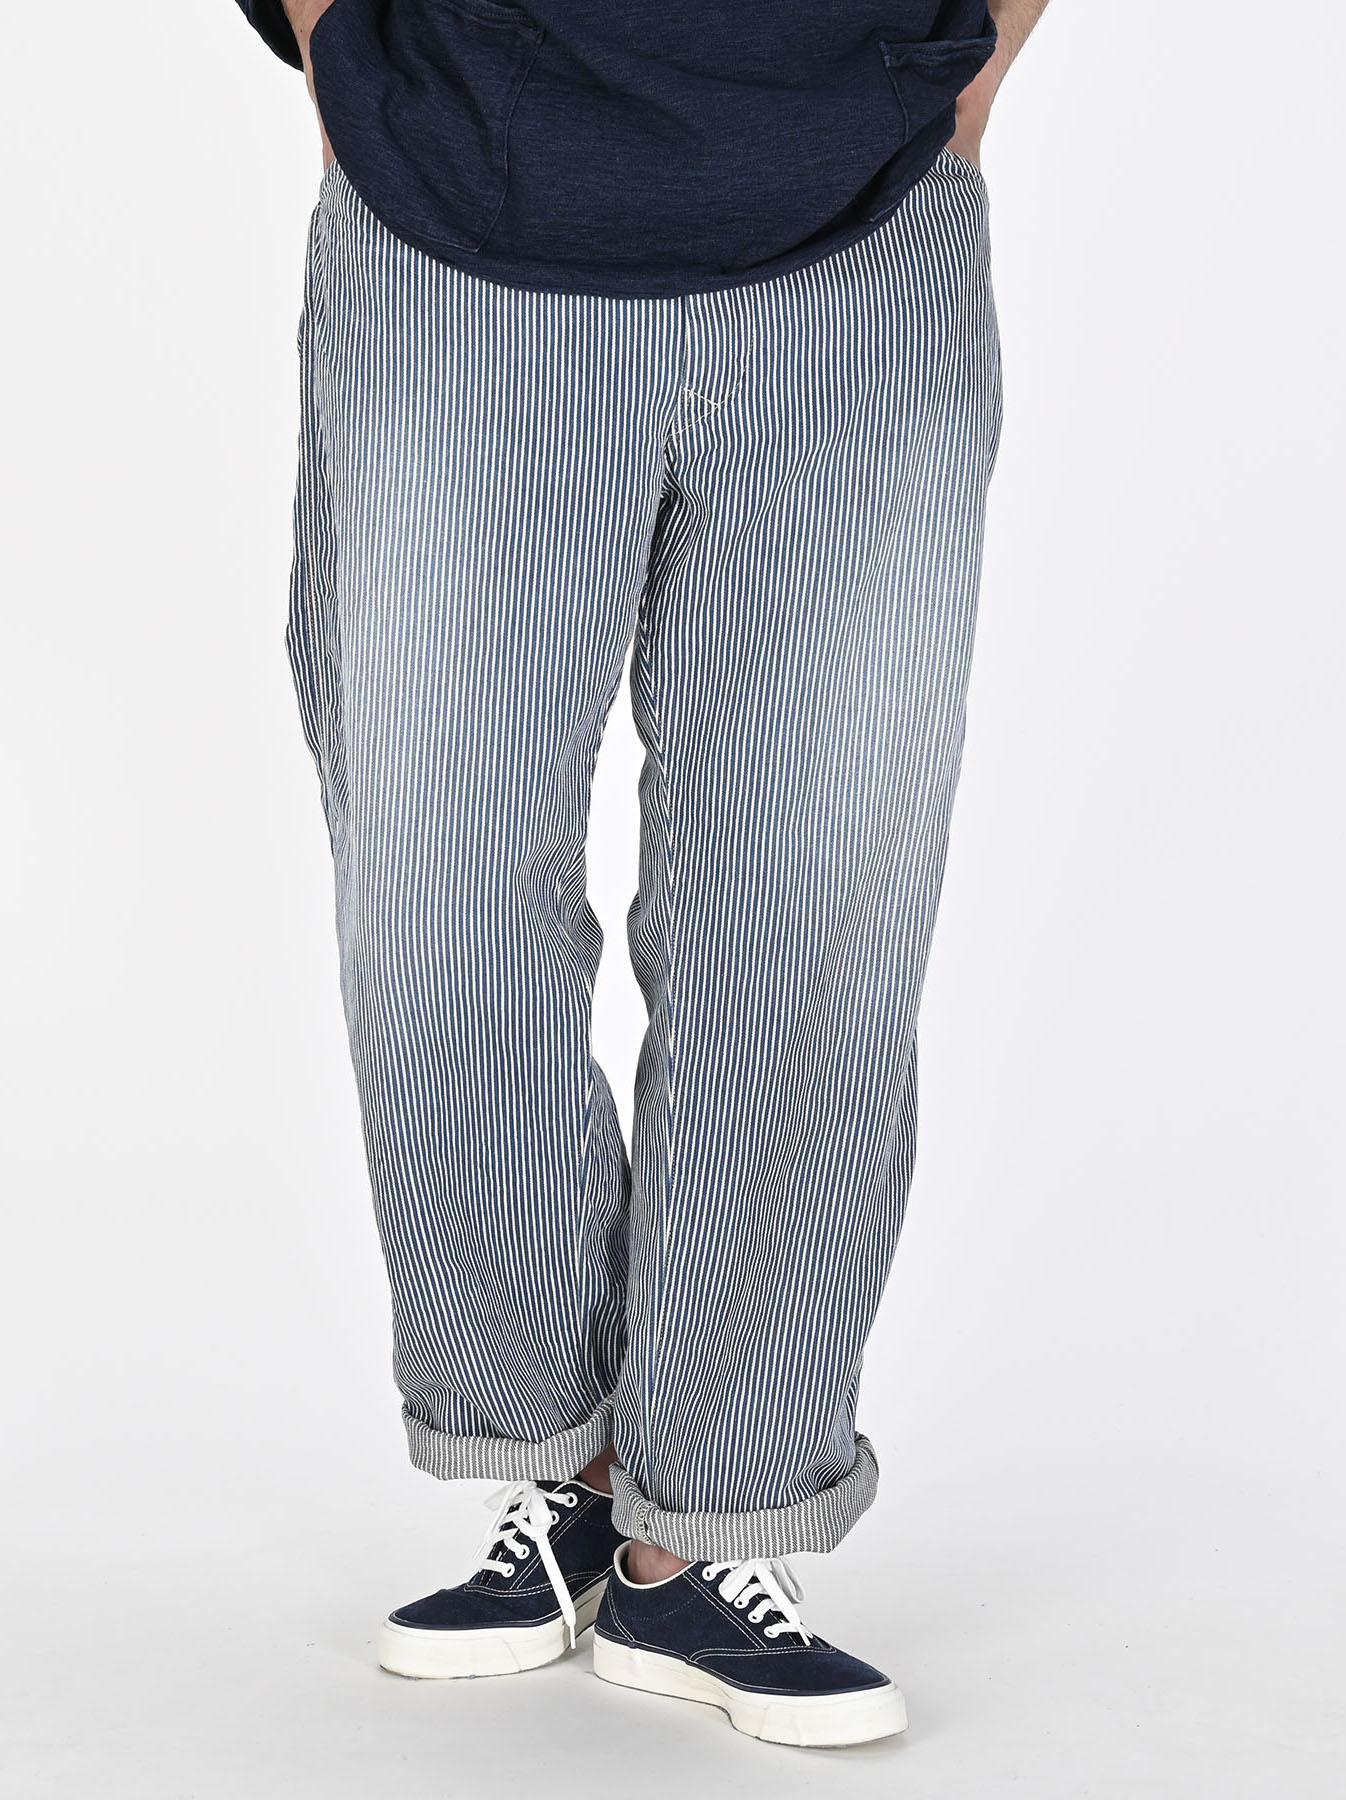 Indigo 908 Painter Pants Distressed (0721)-6